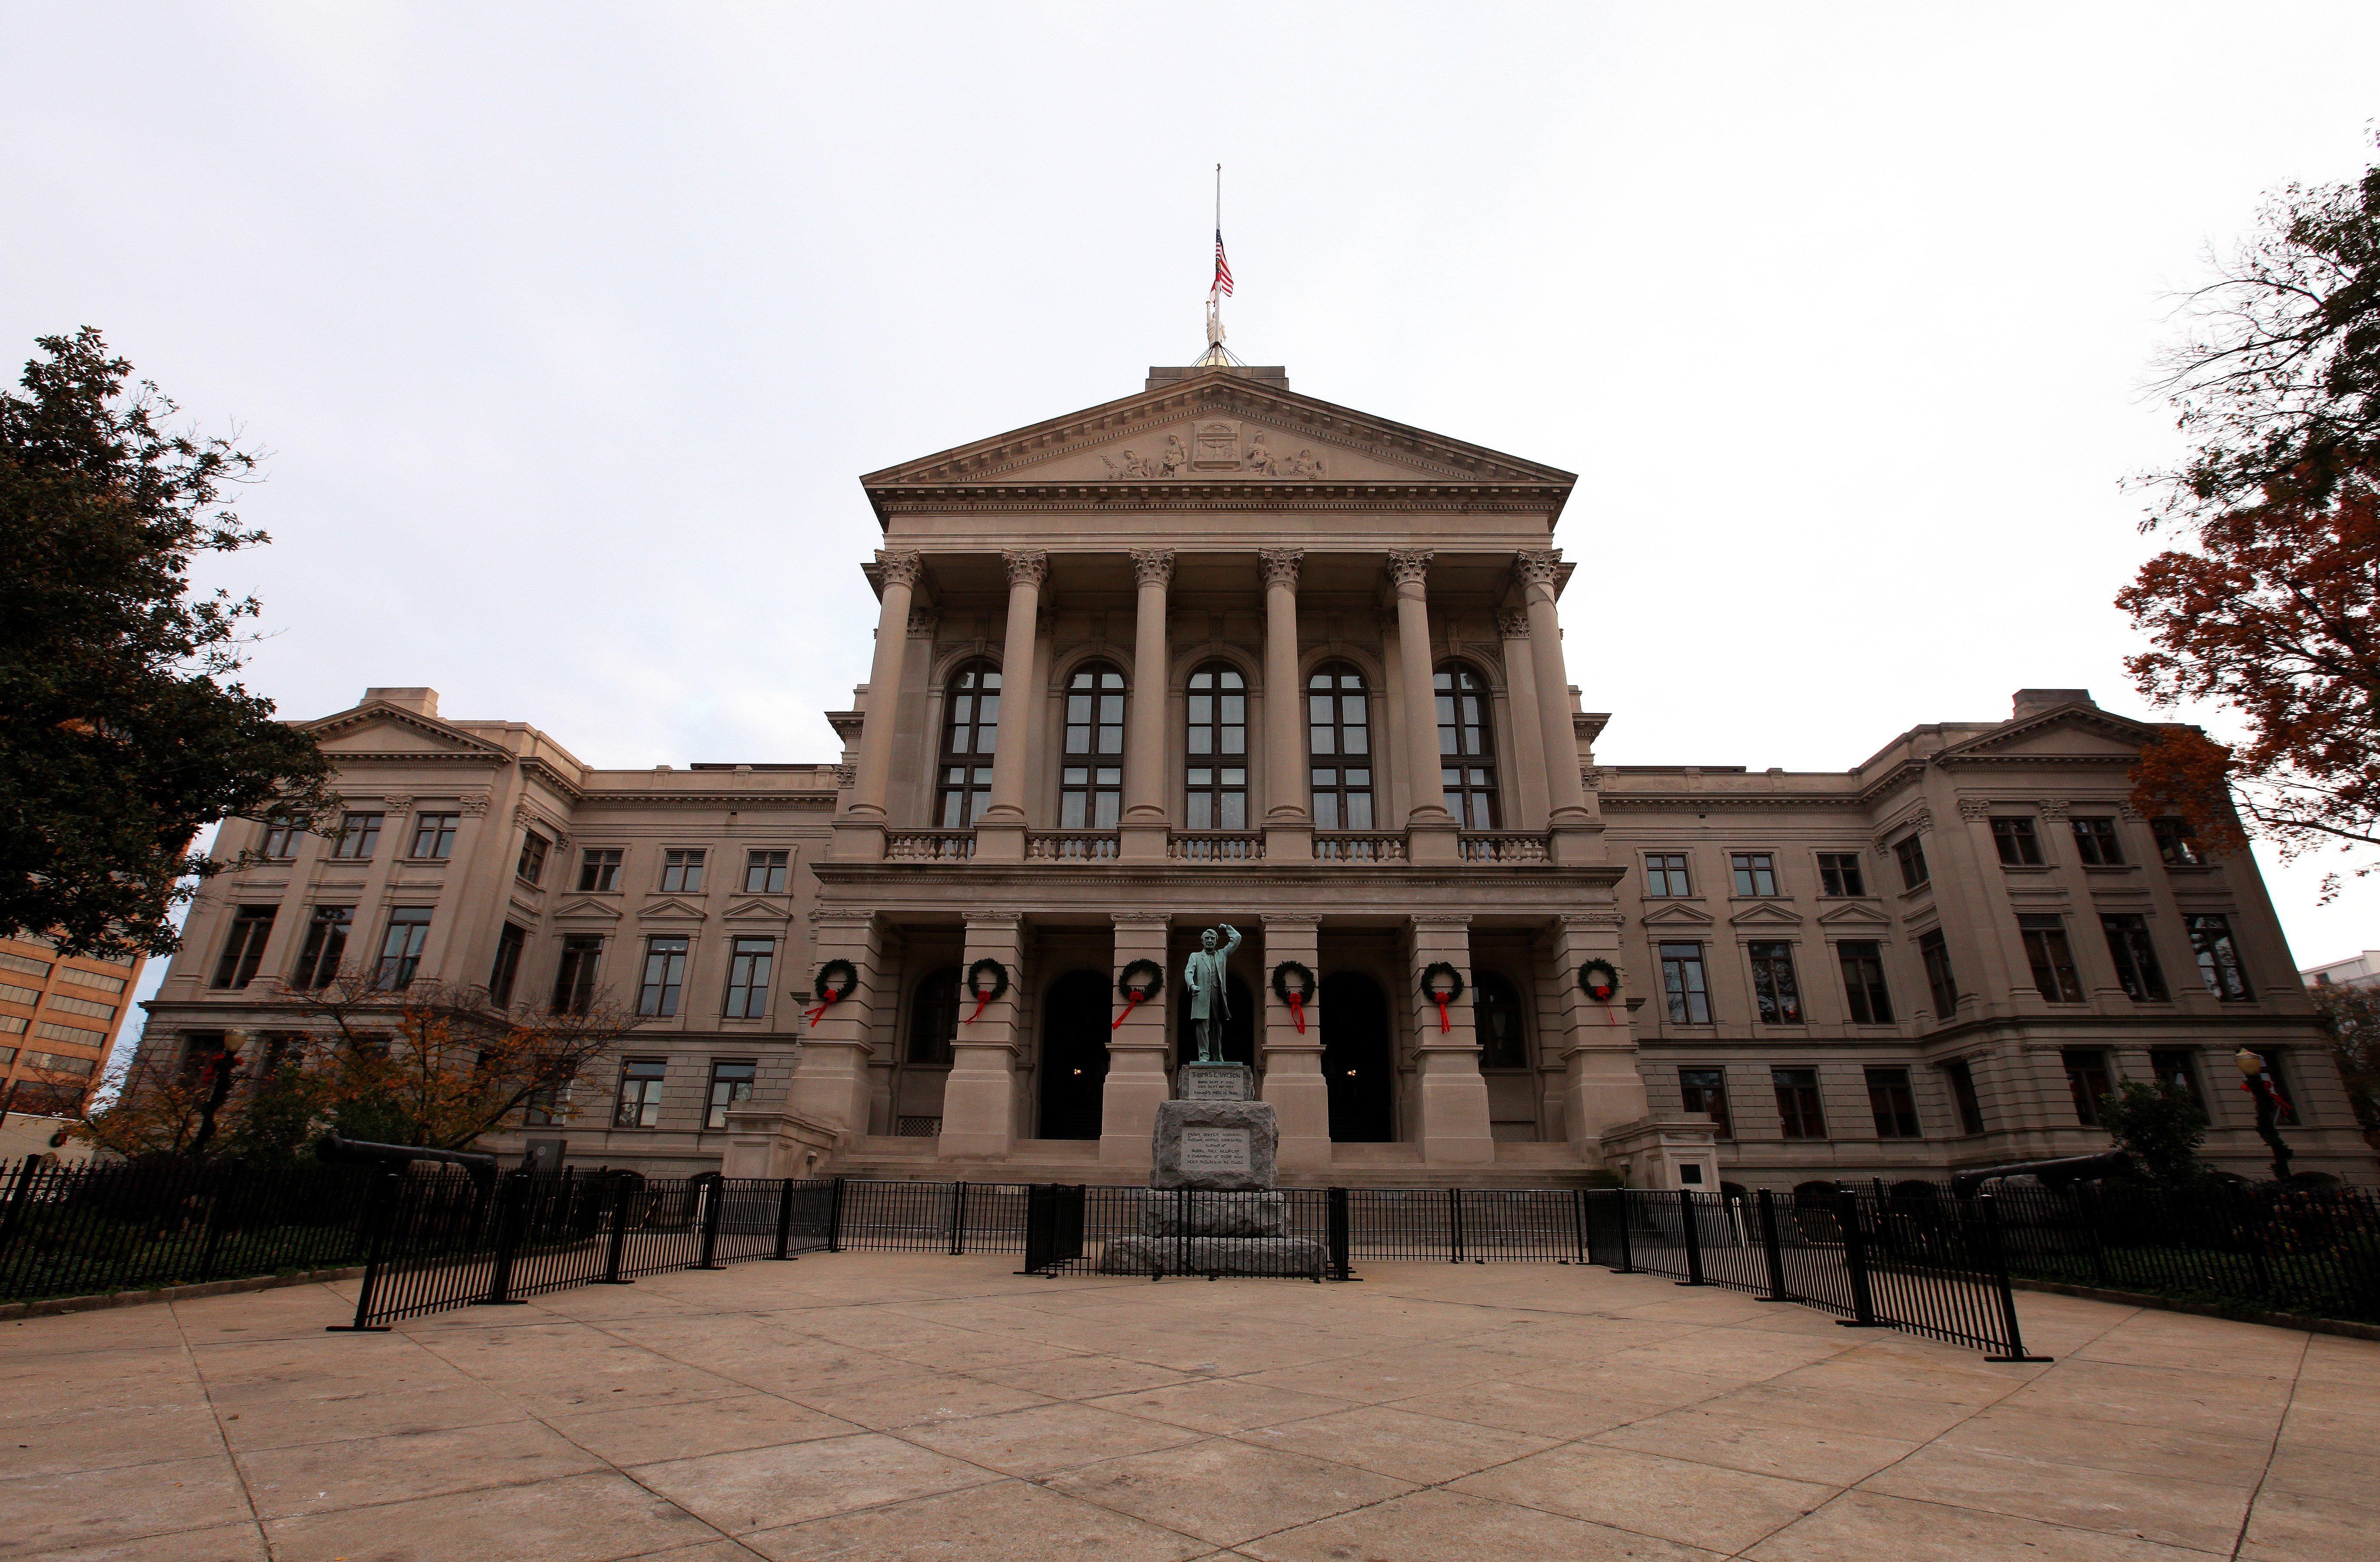 ATLANTA - NOVEMBER 23:  Georgia State Capitol Building, in Atlanta, Georgia on NOVEMBER 23, 2013.  (Photo By Raymond Boyd/Getty Images)